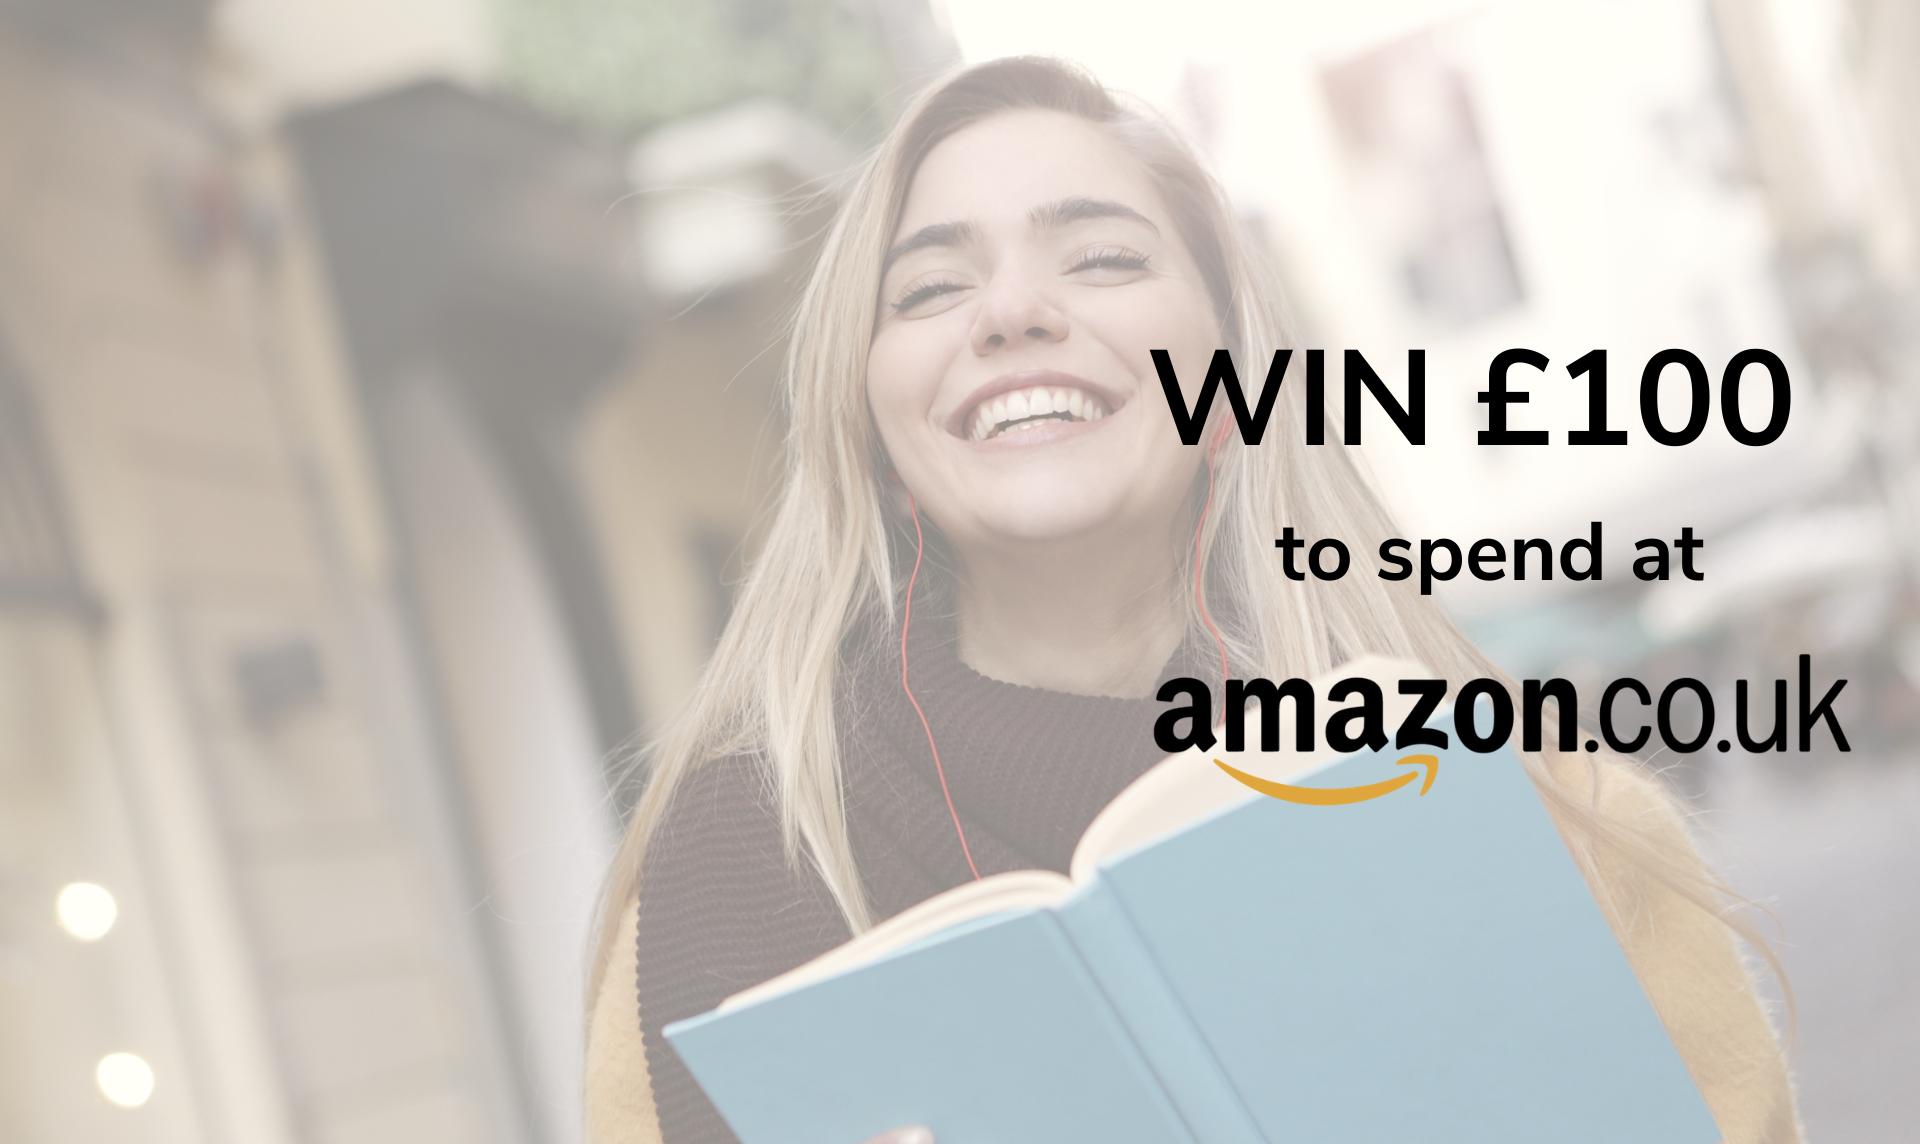 Five £100 Amazon vouchers to be won